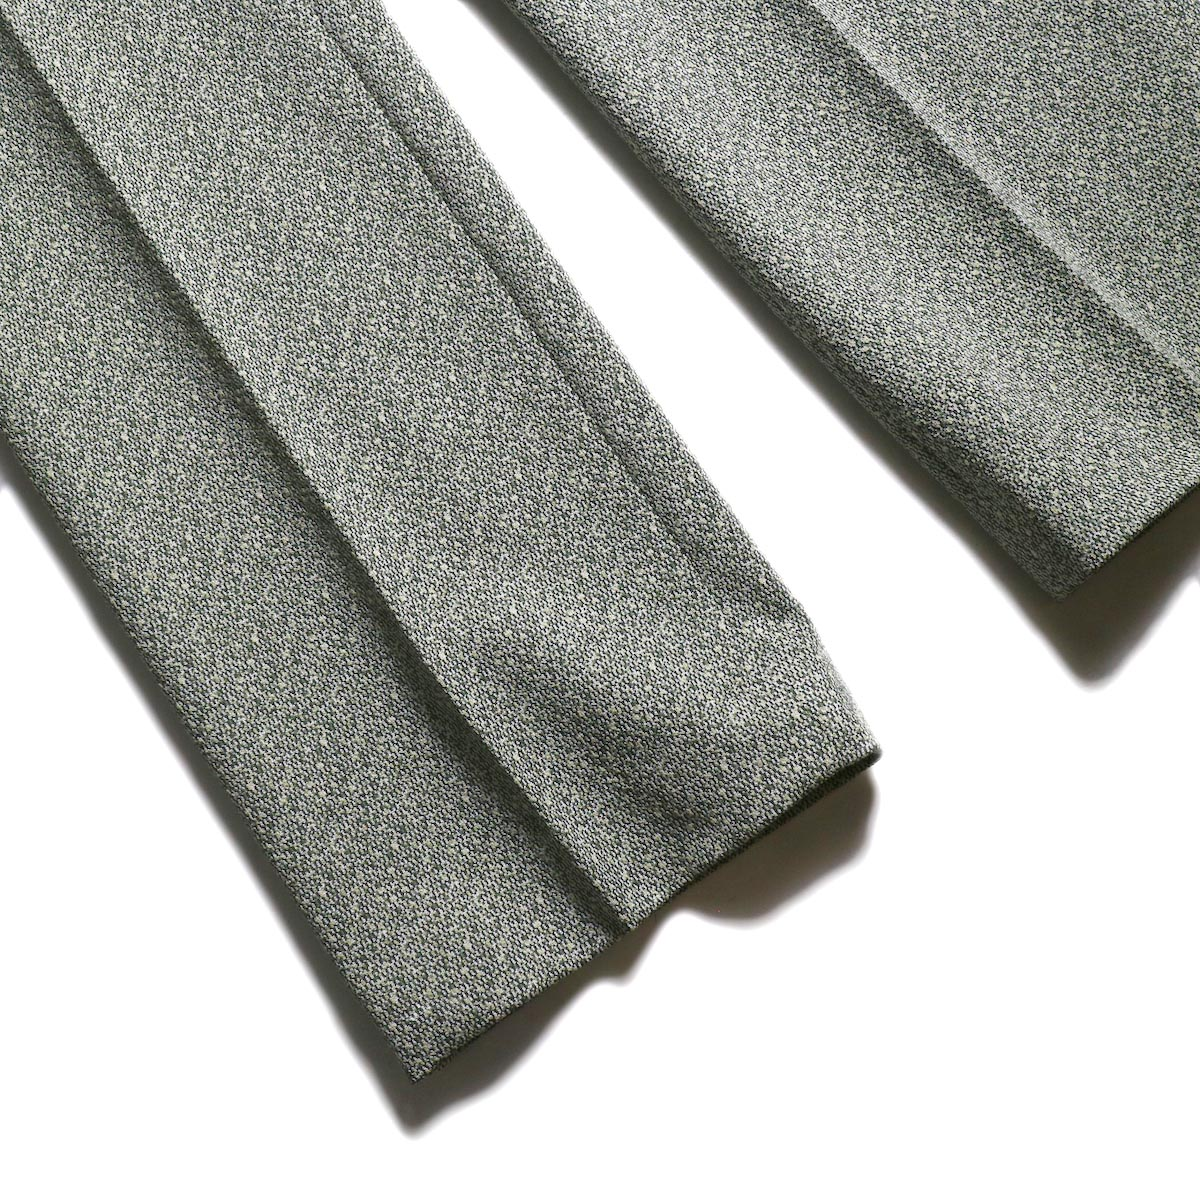 FUMIKA UCHIDA / Poli Tweed Straight Slacks -Green 裾